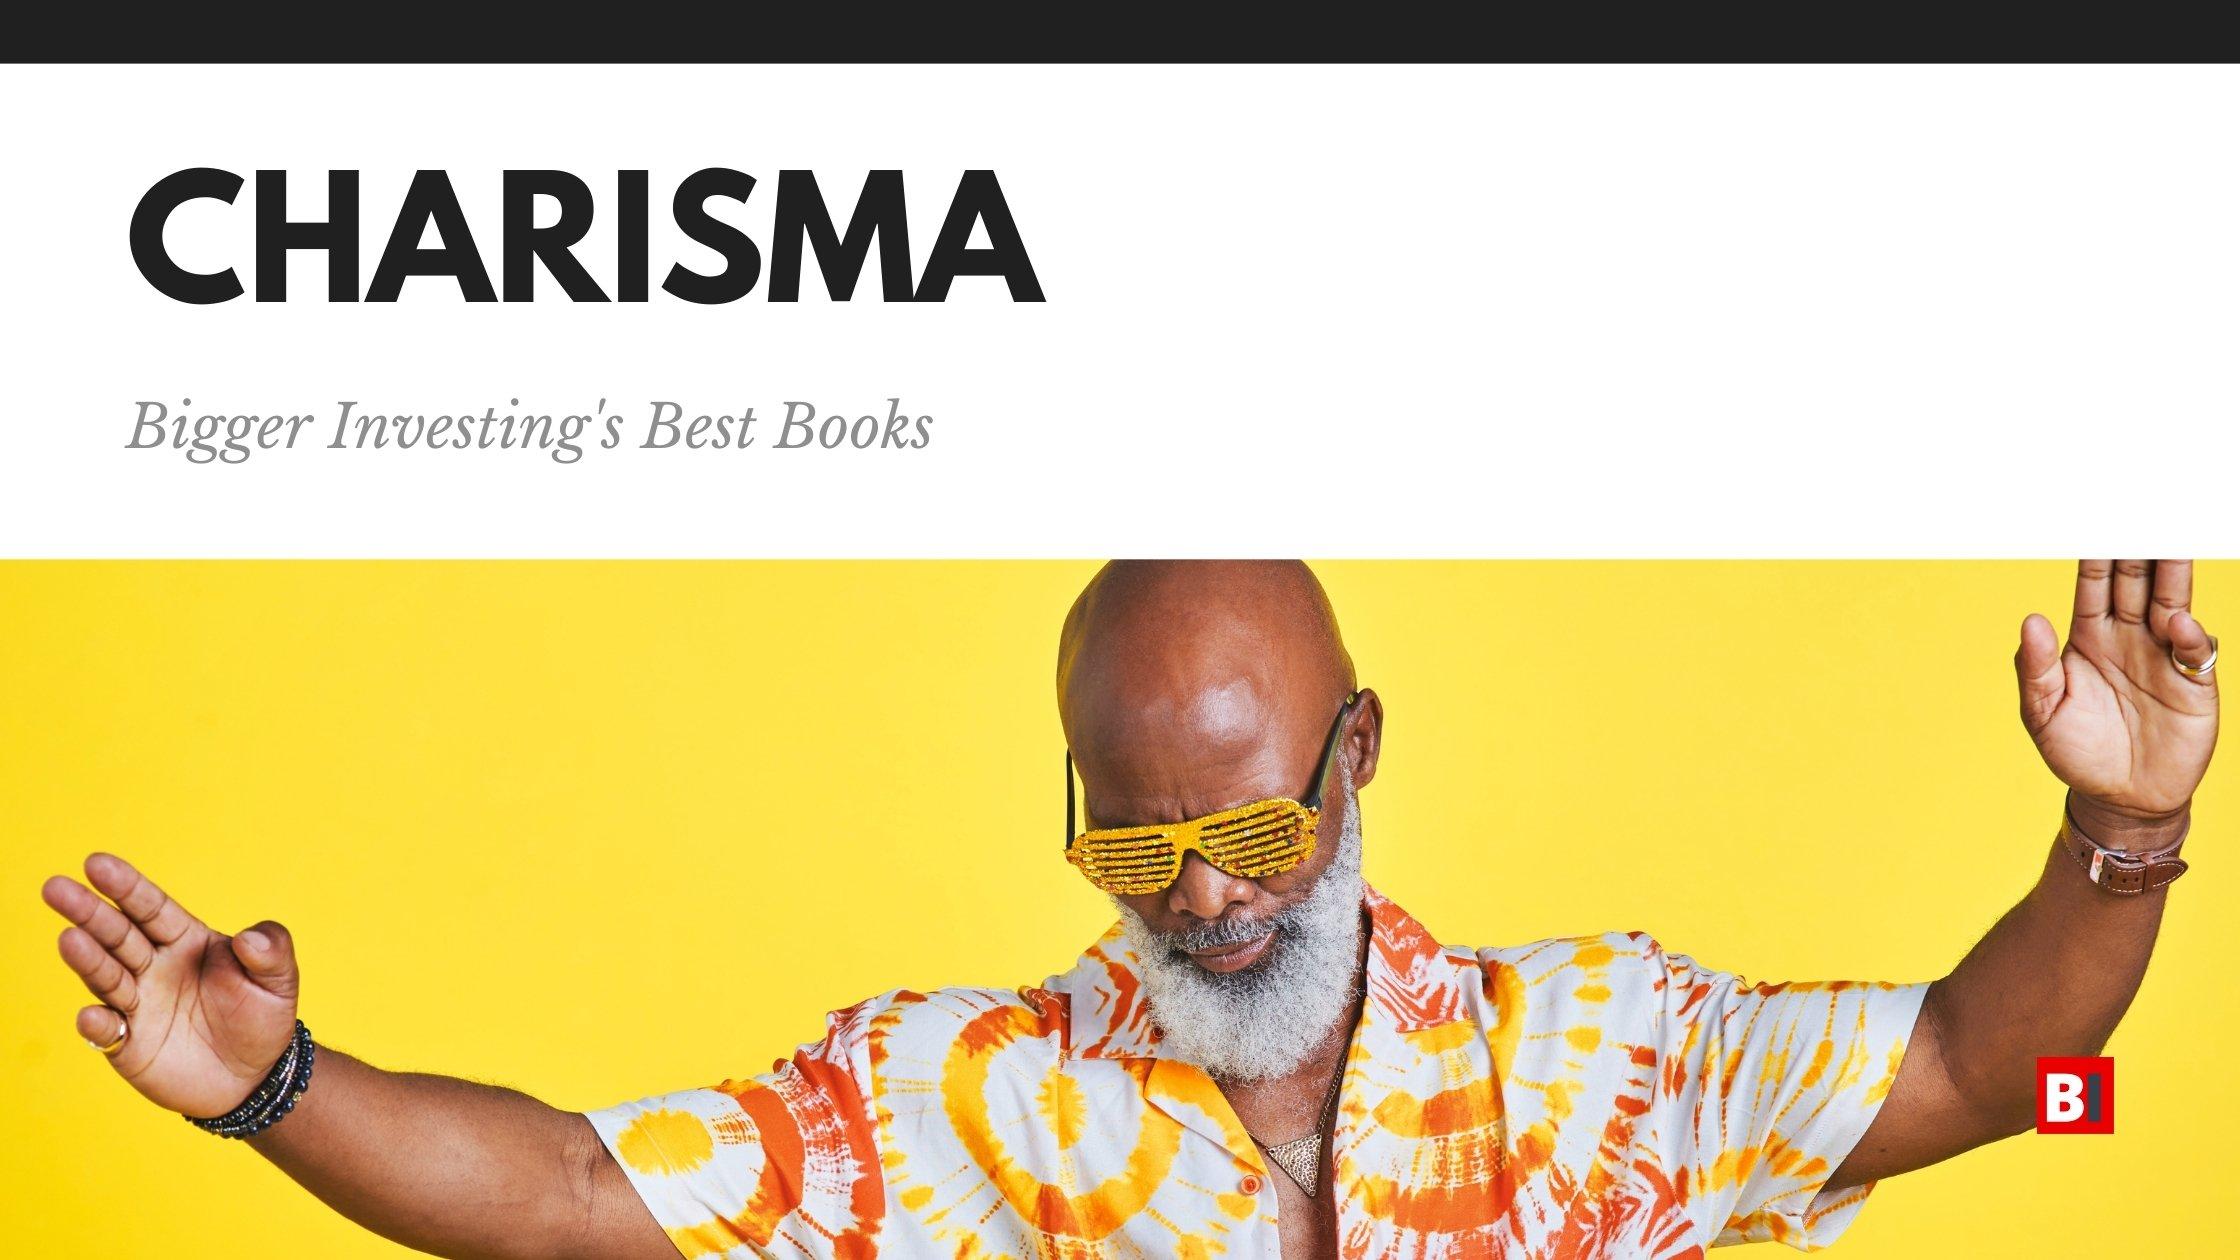 Best Books on Charisma